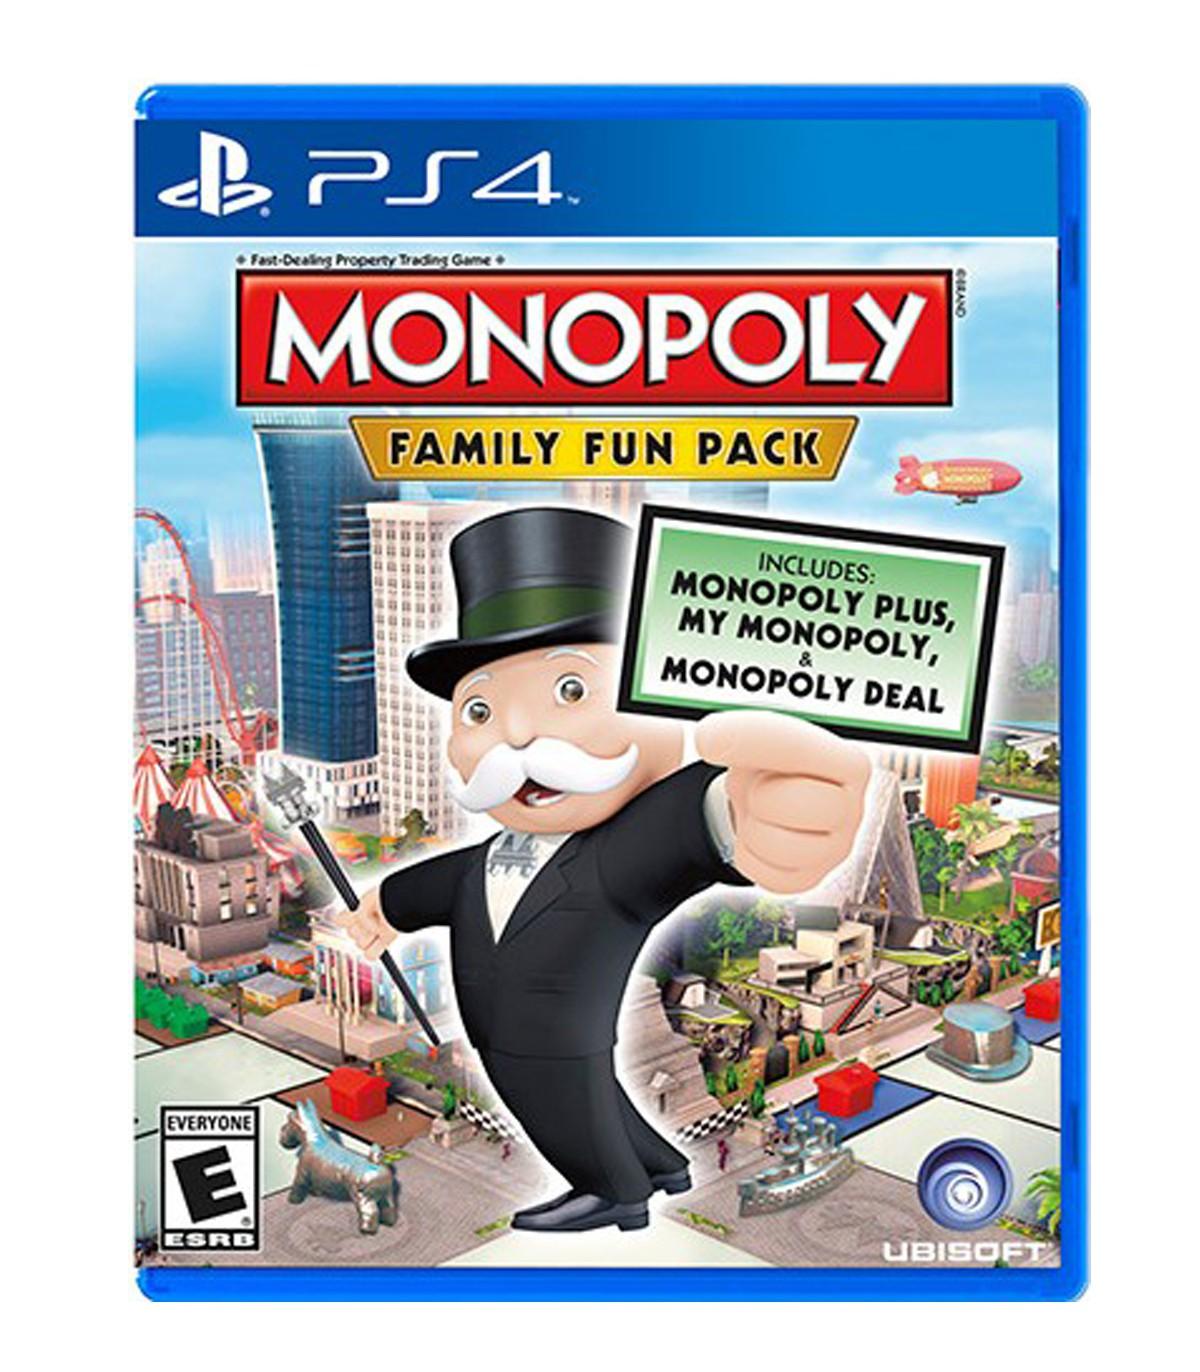 بازی Monopoly Family Fun Pack  - پلی استیشن 4